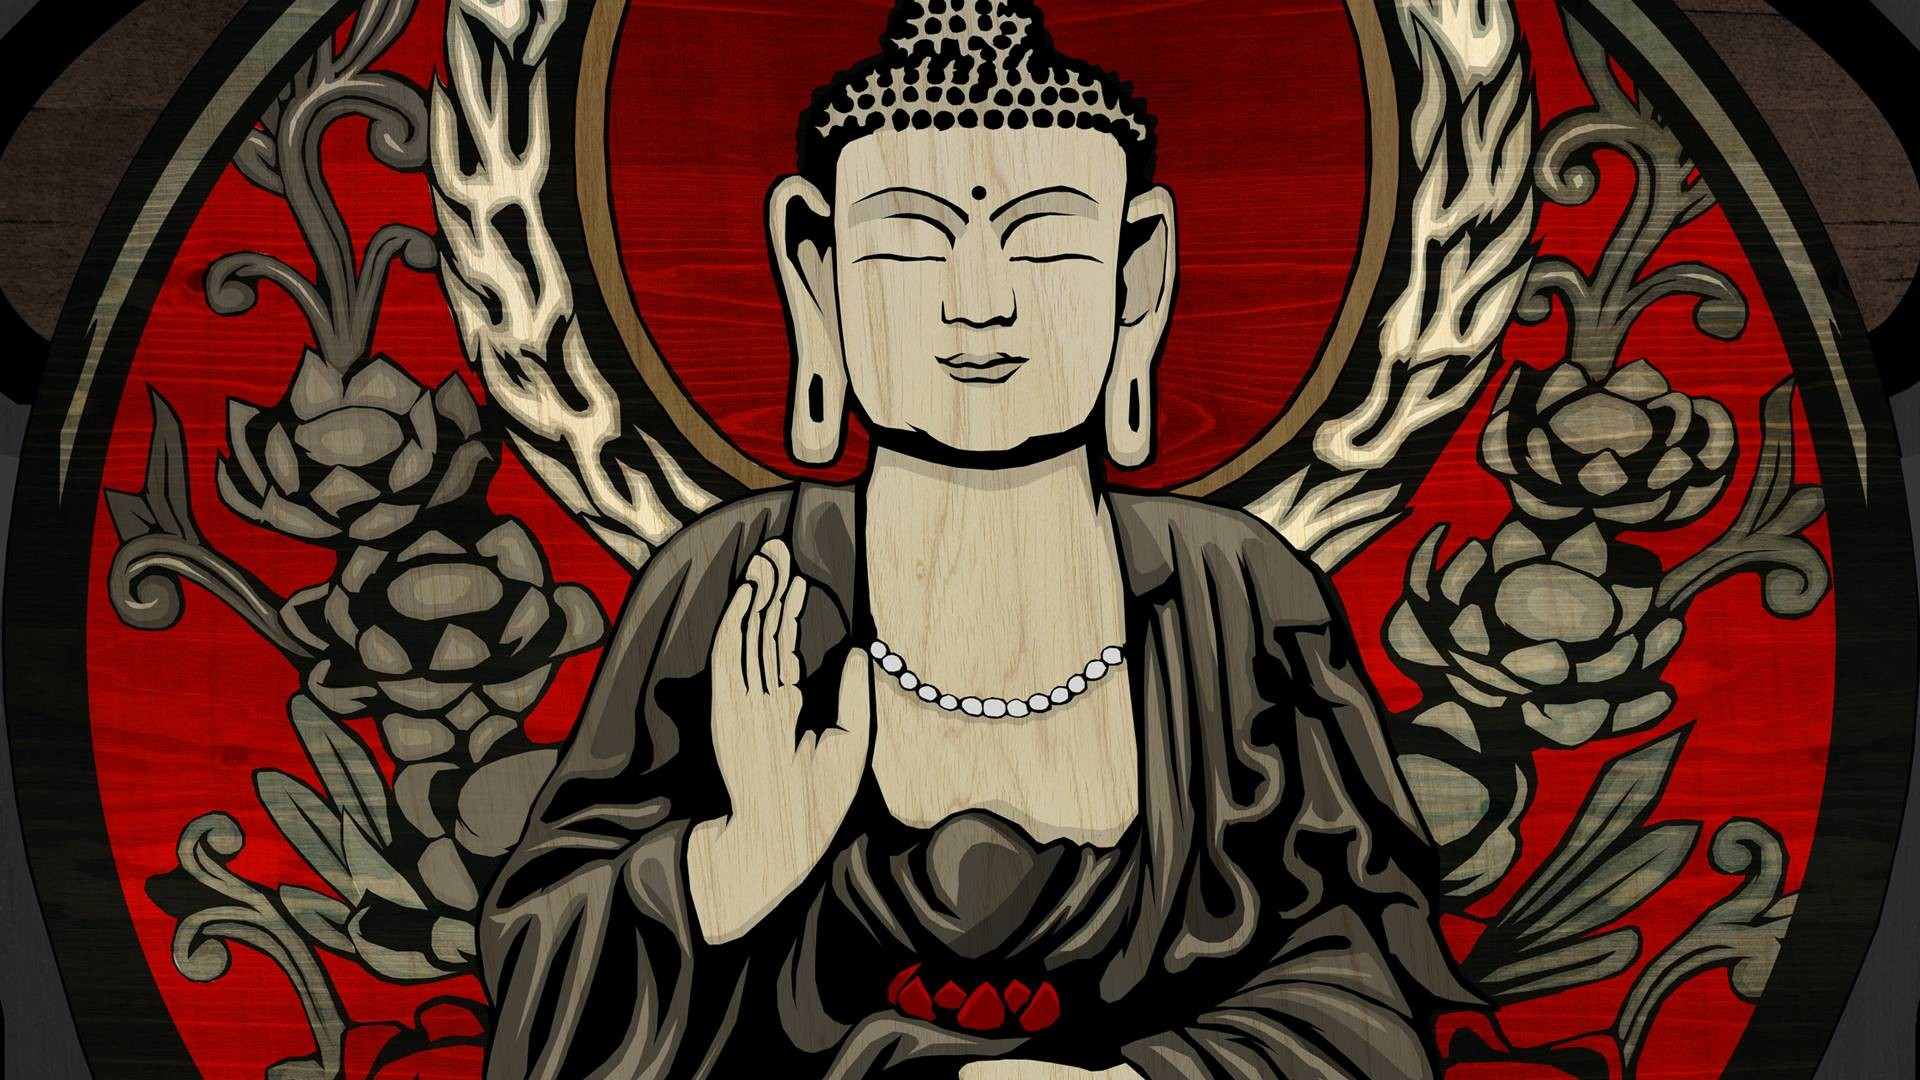 Buddhism Computer Wallpapers, Desktop Backgrounds Id: 247054